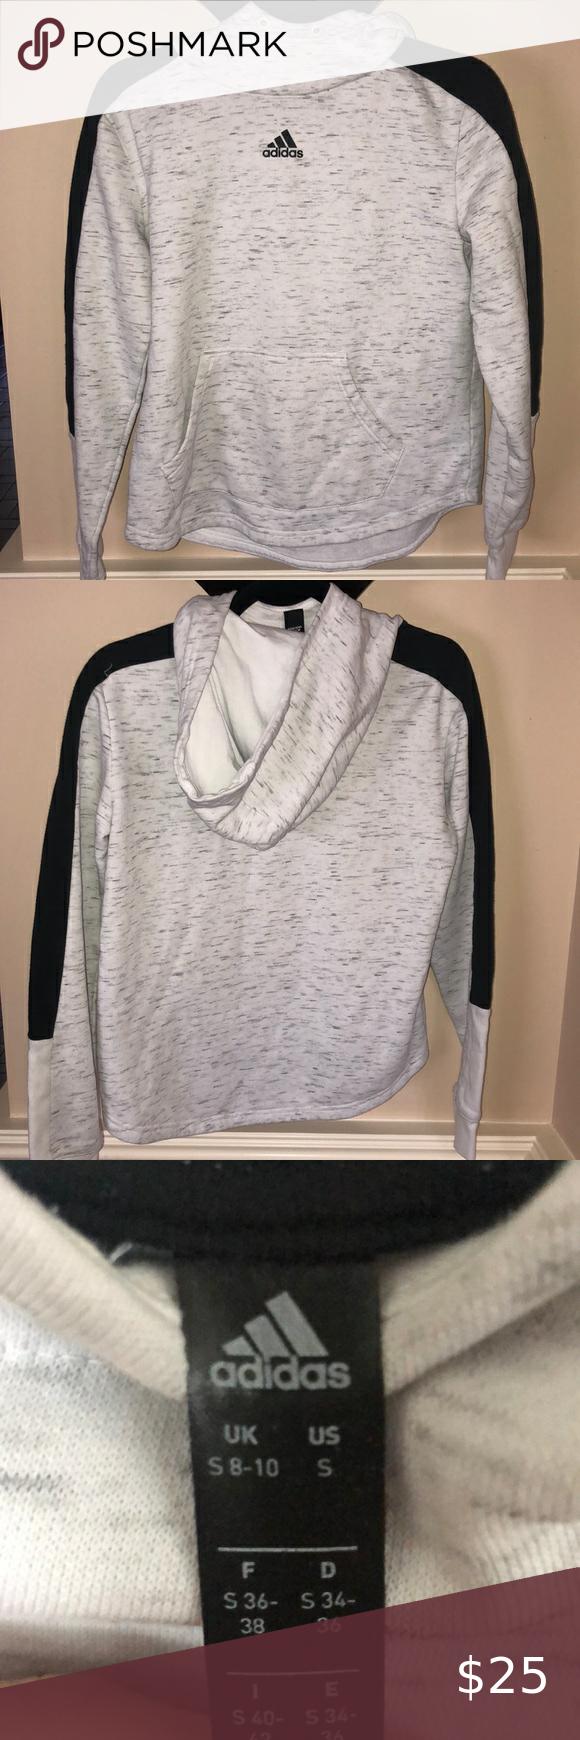 Adidas Color Block Hoodie Sweatshirt Size Small Sweatshirts Hoodie Comfy Hoodies Adidas Hoodie [ 1740 x 580 Pixel ]